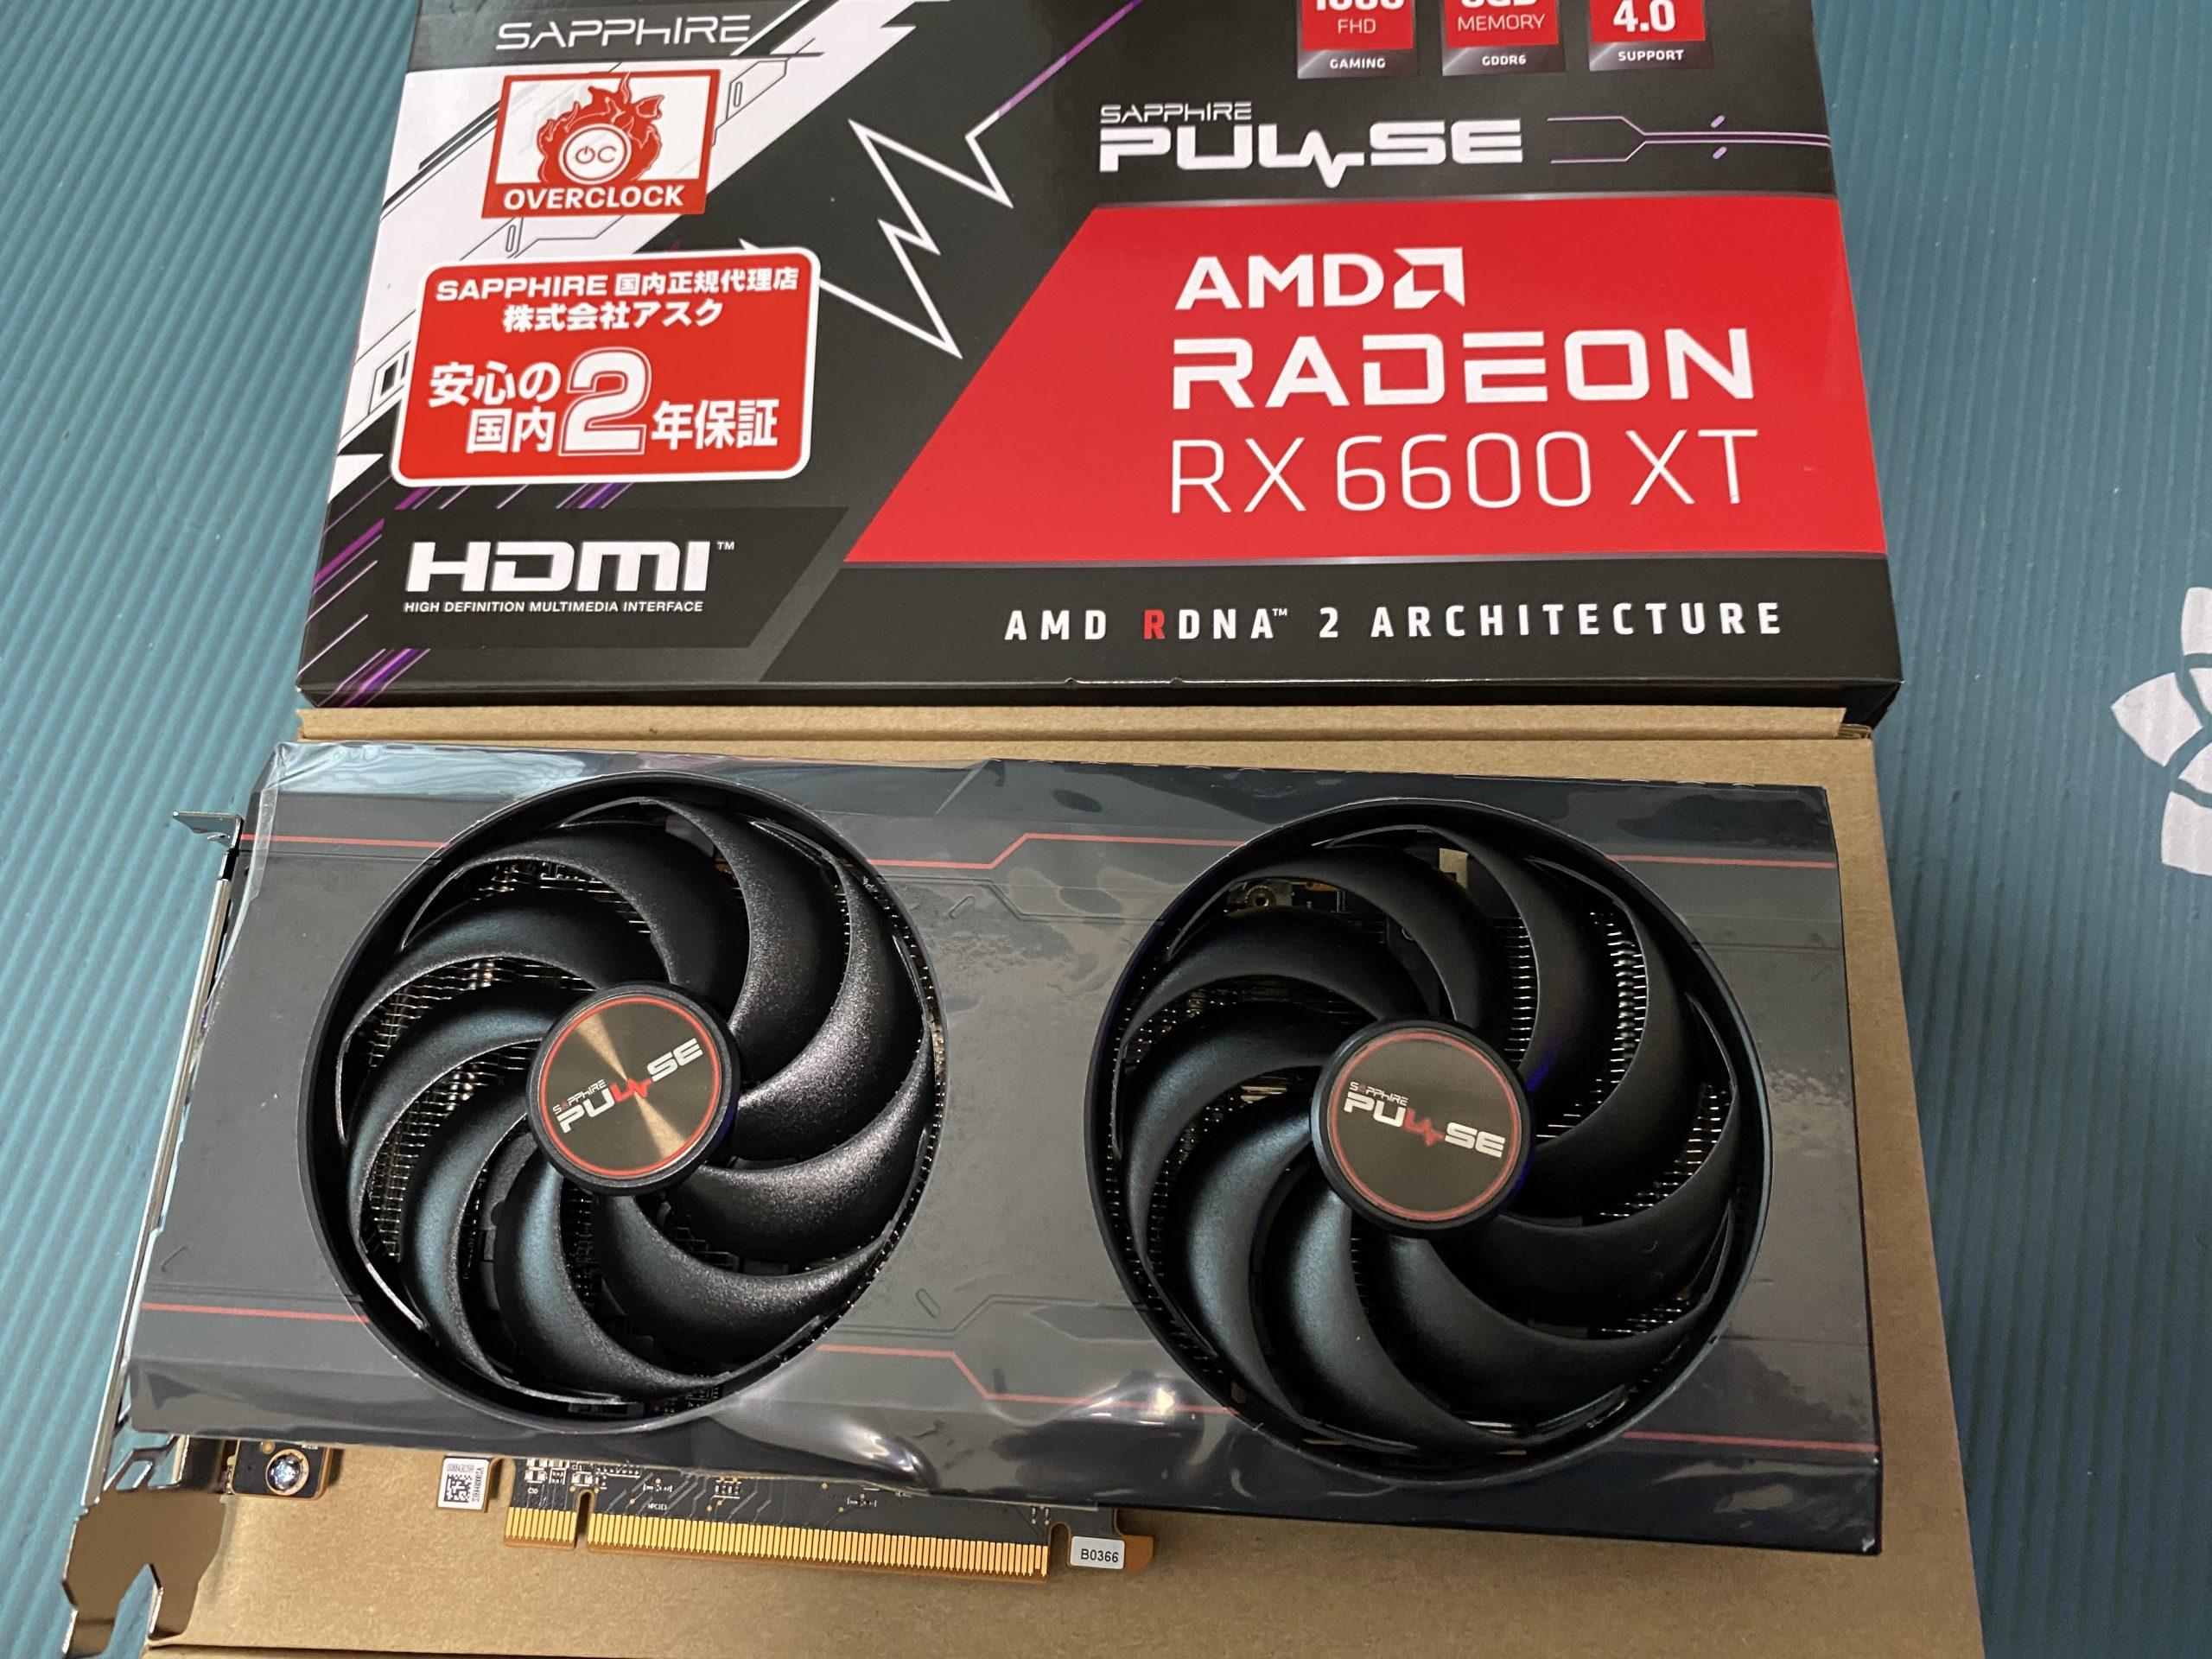 SAPPHIRE PULSE Radeon RX 6600 XT GAMING OC 8G GDDR6